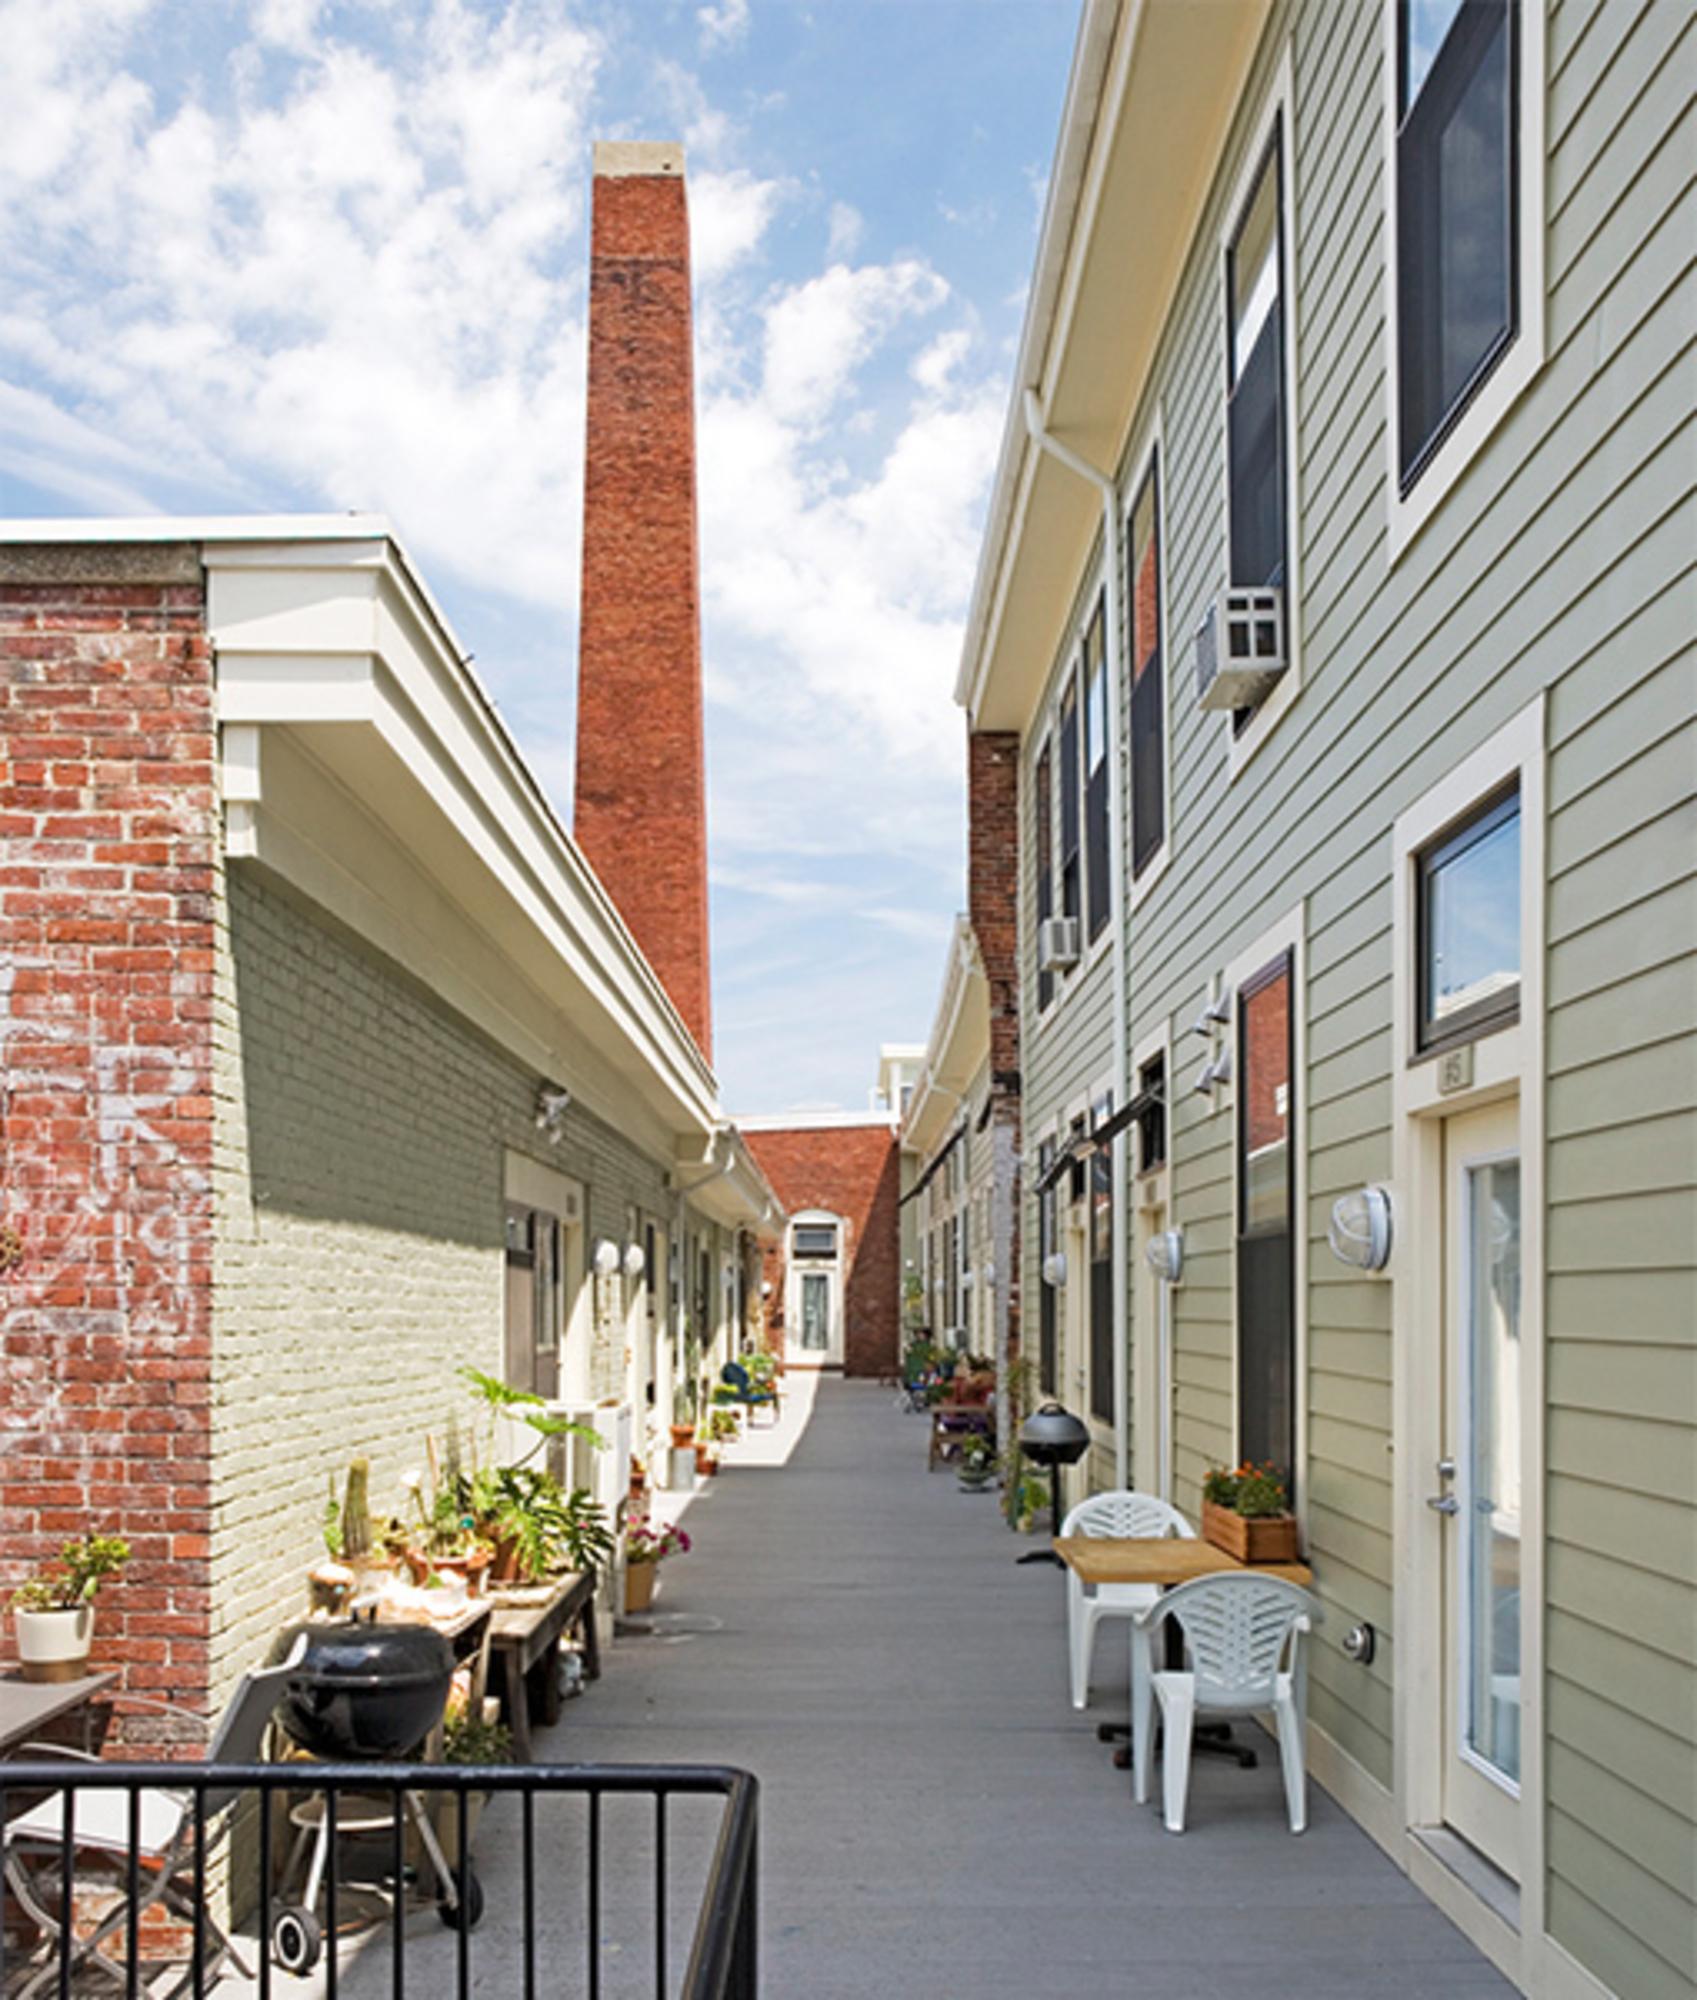 Brookside Artist Studios - Rear of property after